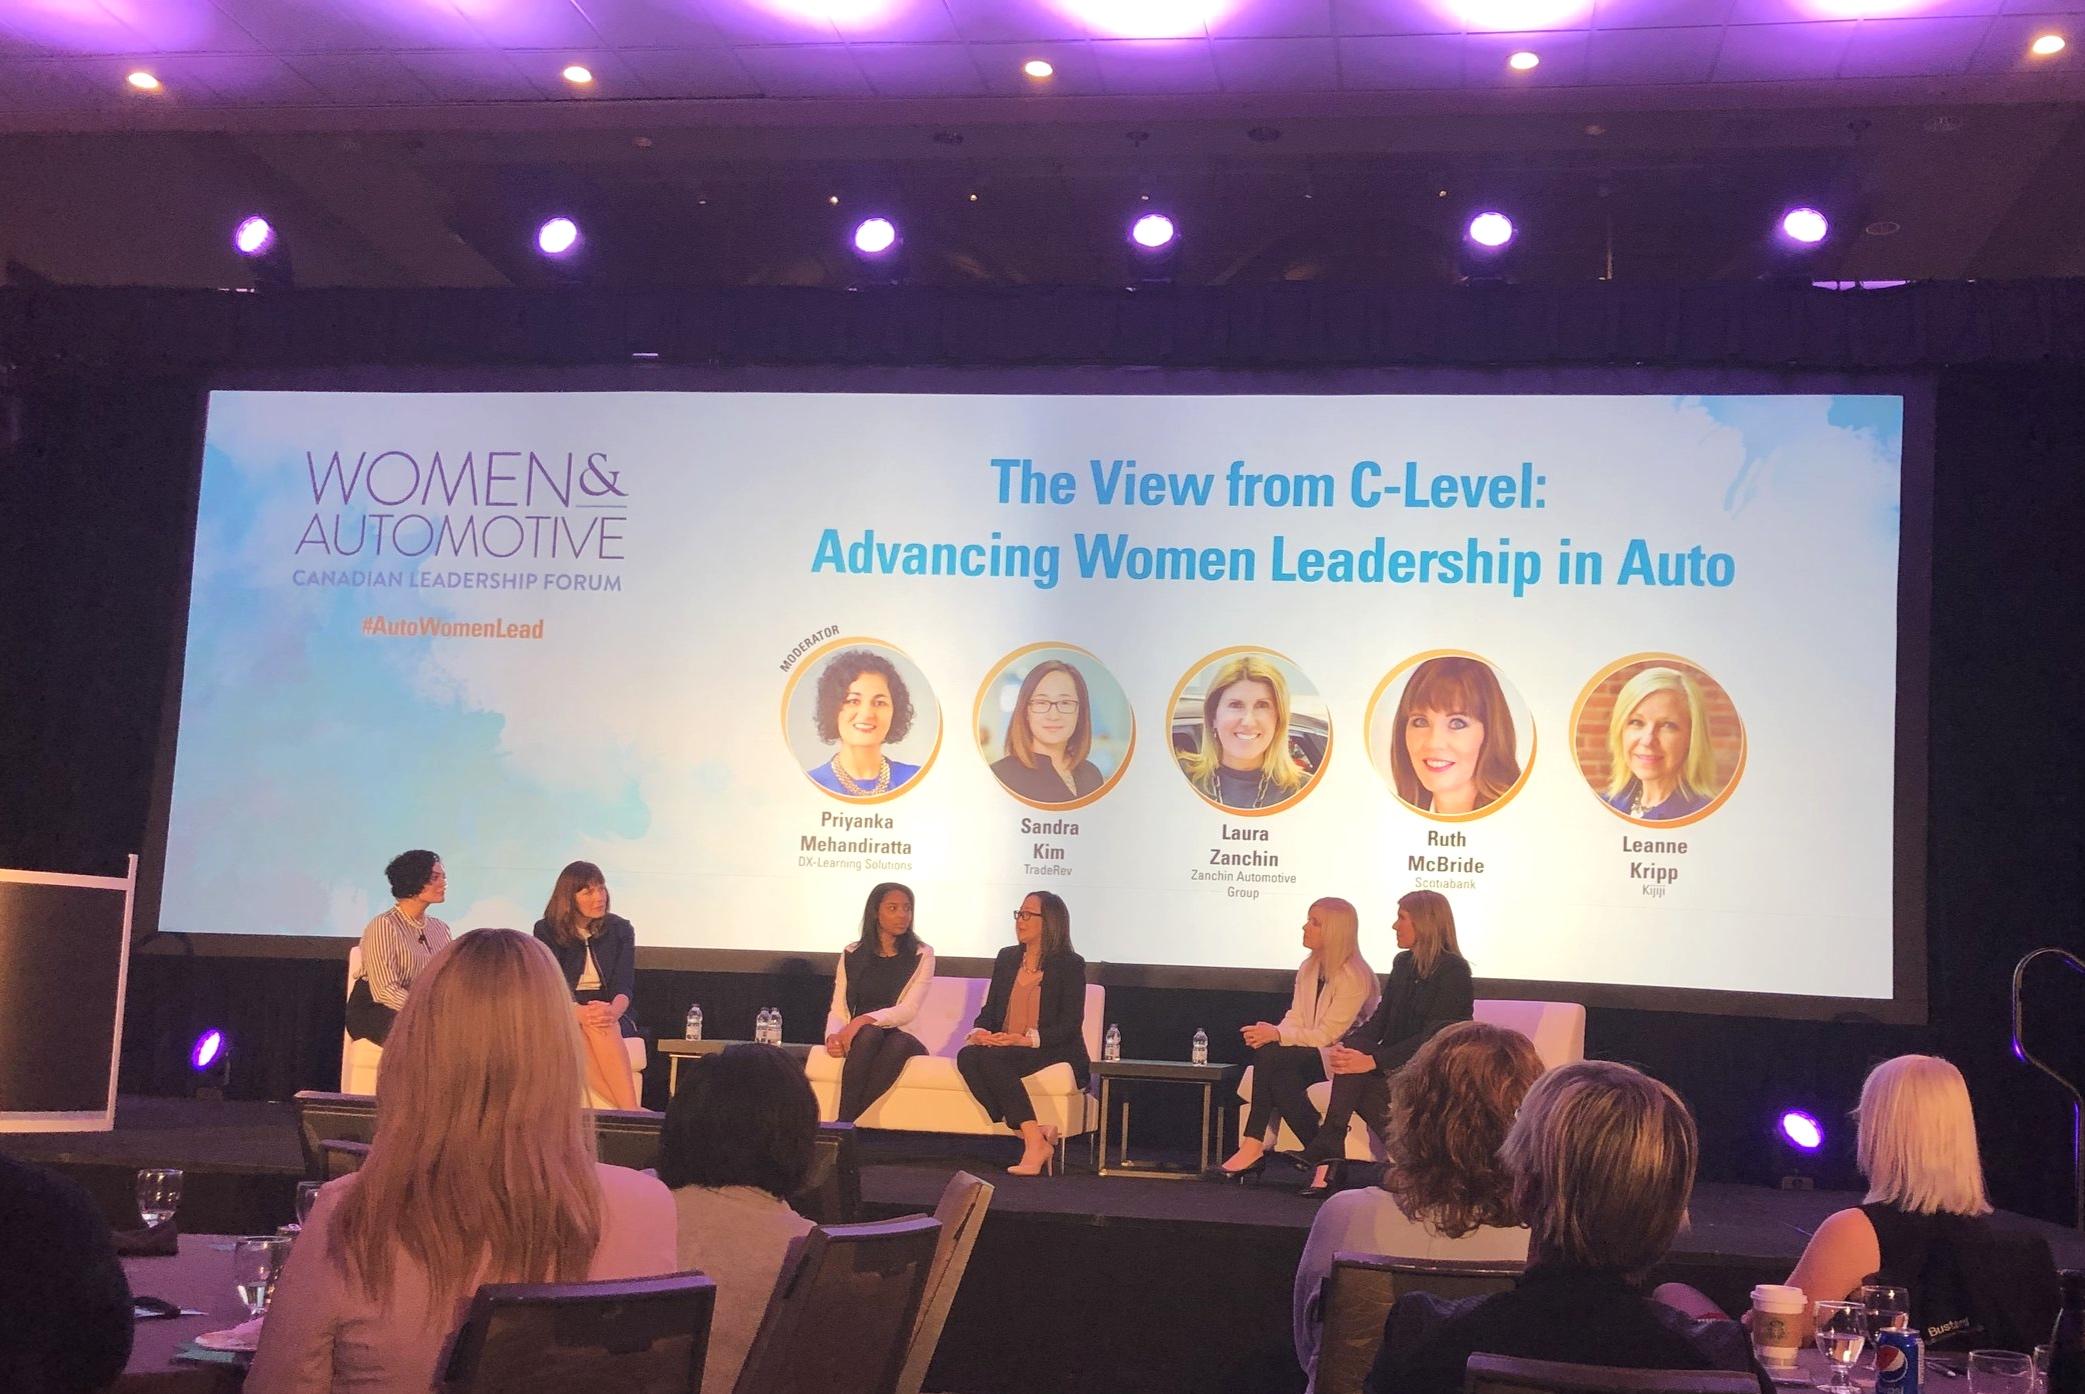 Moderator: Priyanka Mehandiratta - DX-Learning Solutions  Panelists: Sandra Kim - TradeRev, Laura Zanchin - Zanchin Automotive Group, Ruth McBride - Scotiabank, Leanne Kripp - Kijiji